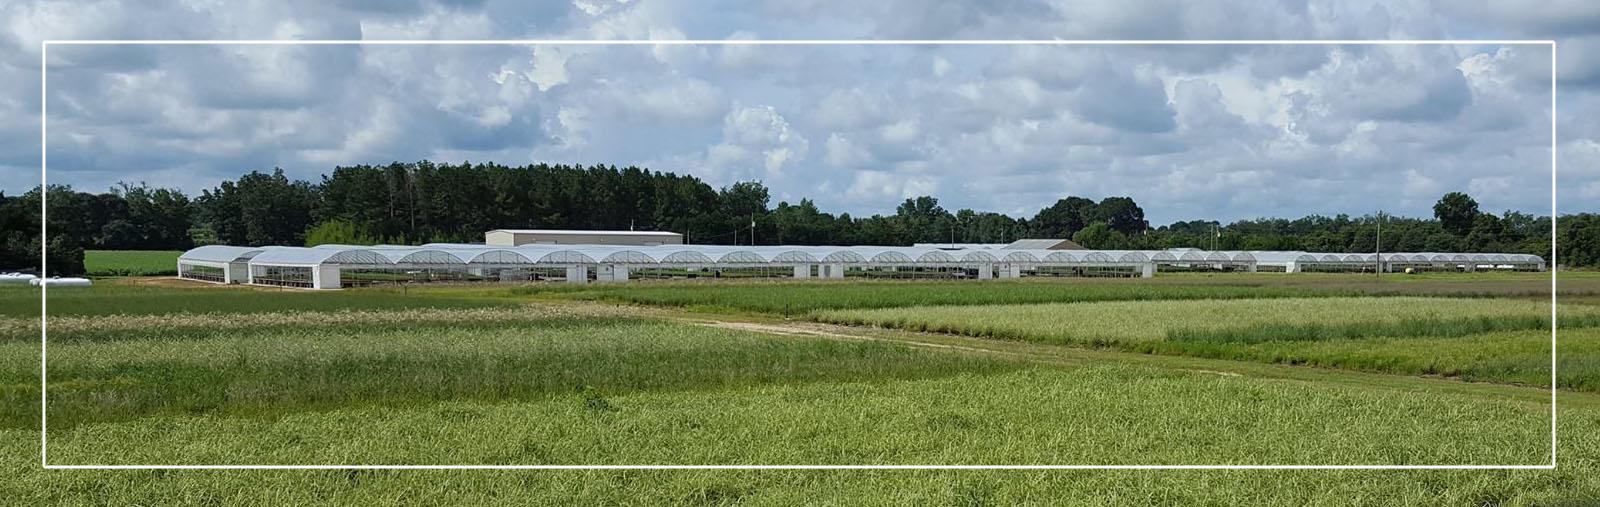 greenhouses-farm-3.jpg